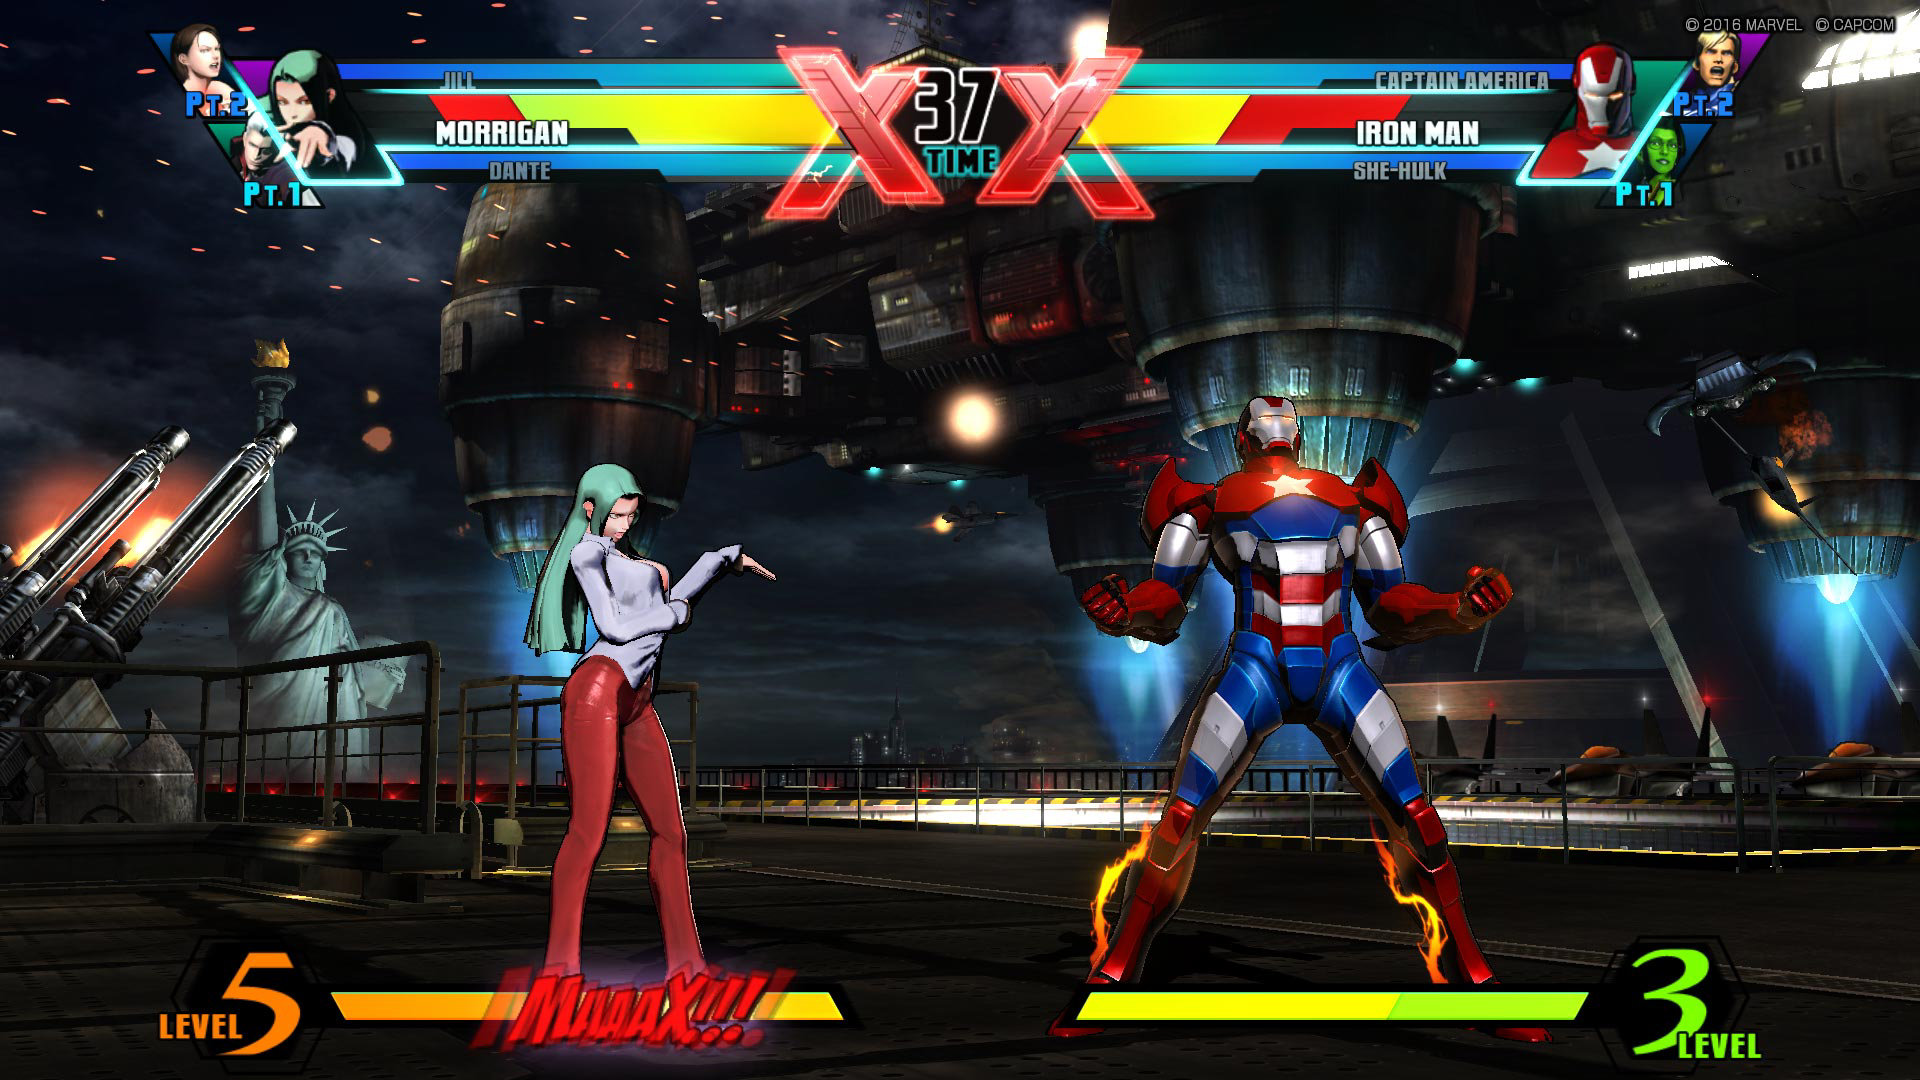 Ultimate Marvel Vs Capcom 3 Game Ps4 Playstation